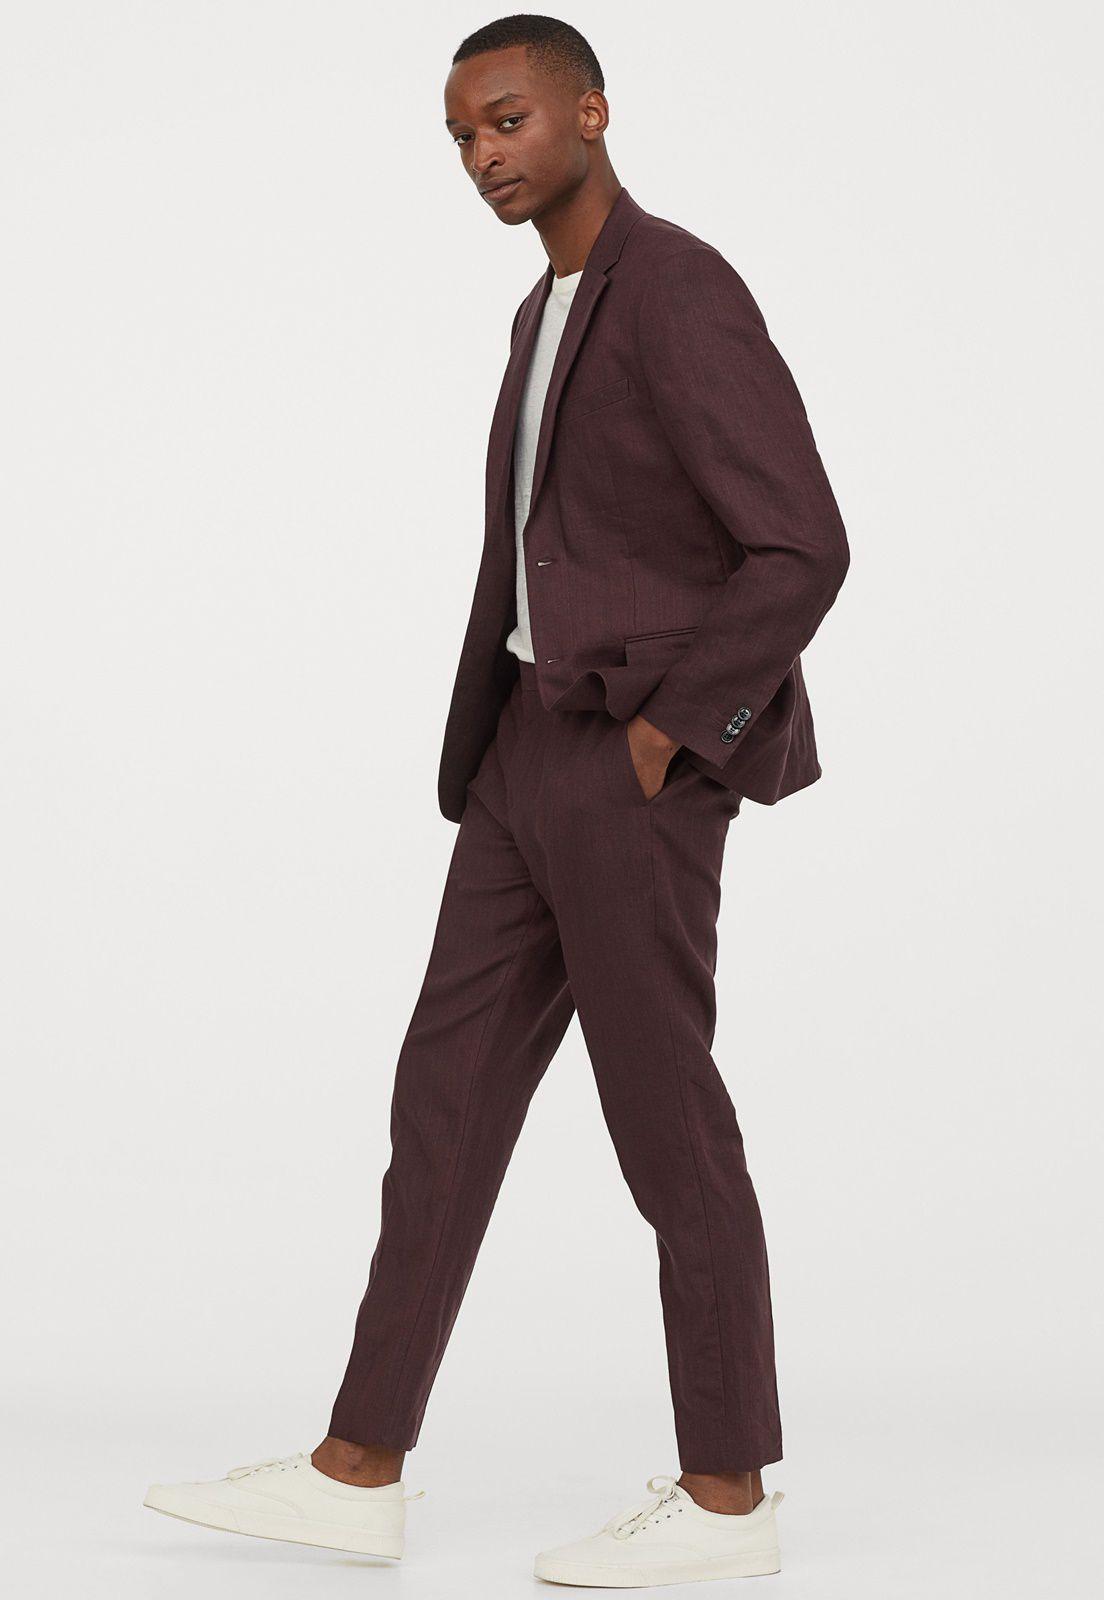 Terno Jordhan Slim Fit Bordo Melange Luxury Edition